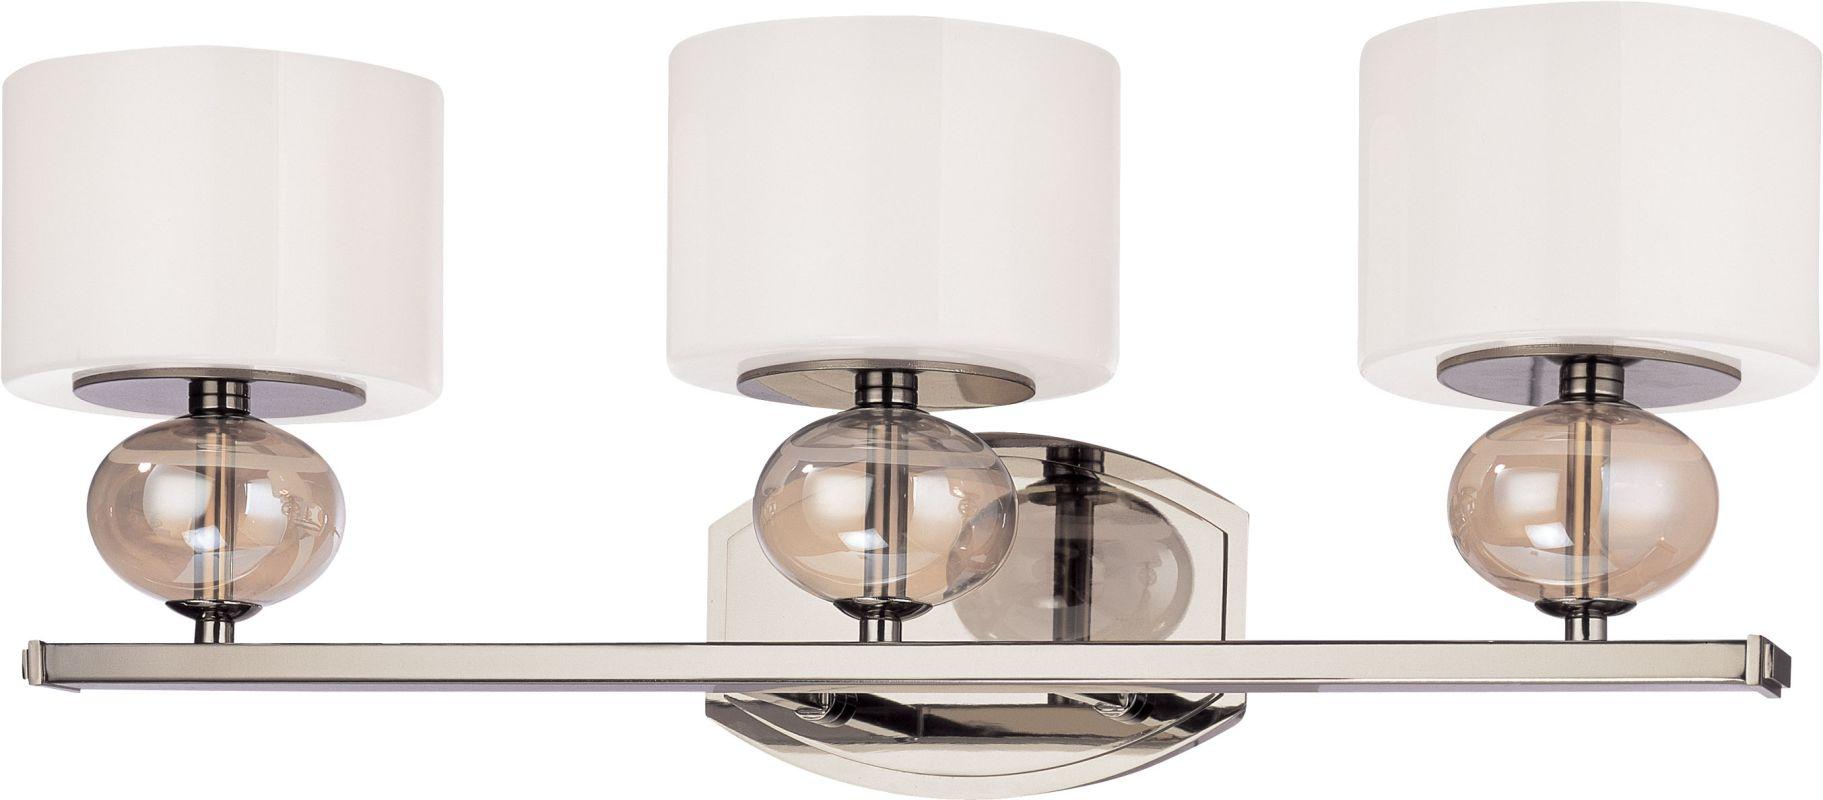 Troy Lighting B2853 Fizz 3 Light Bathroom Vanity Light with White